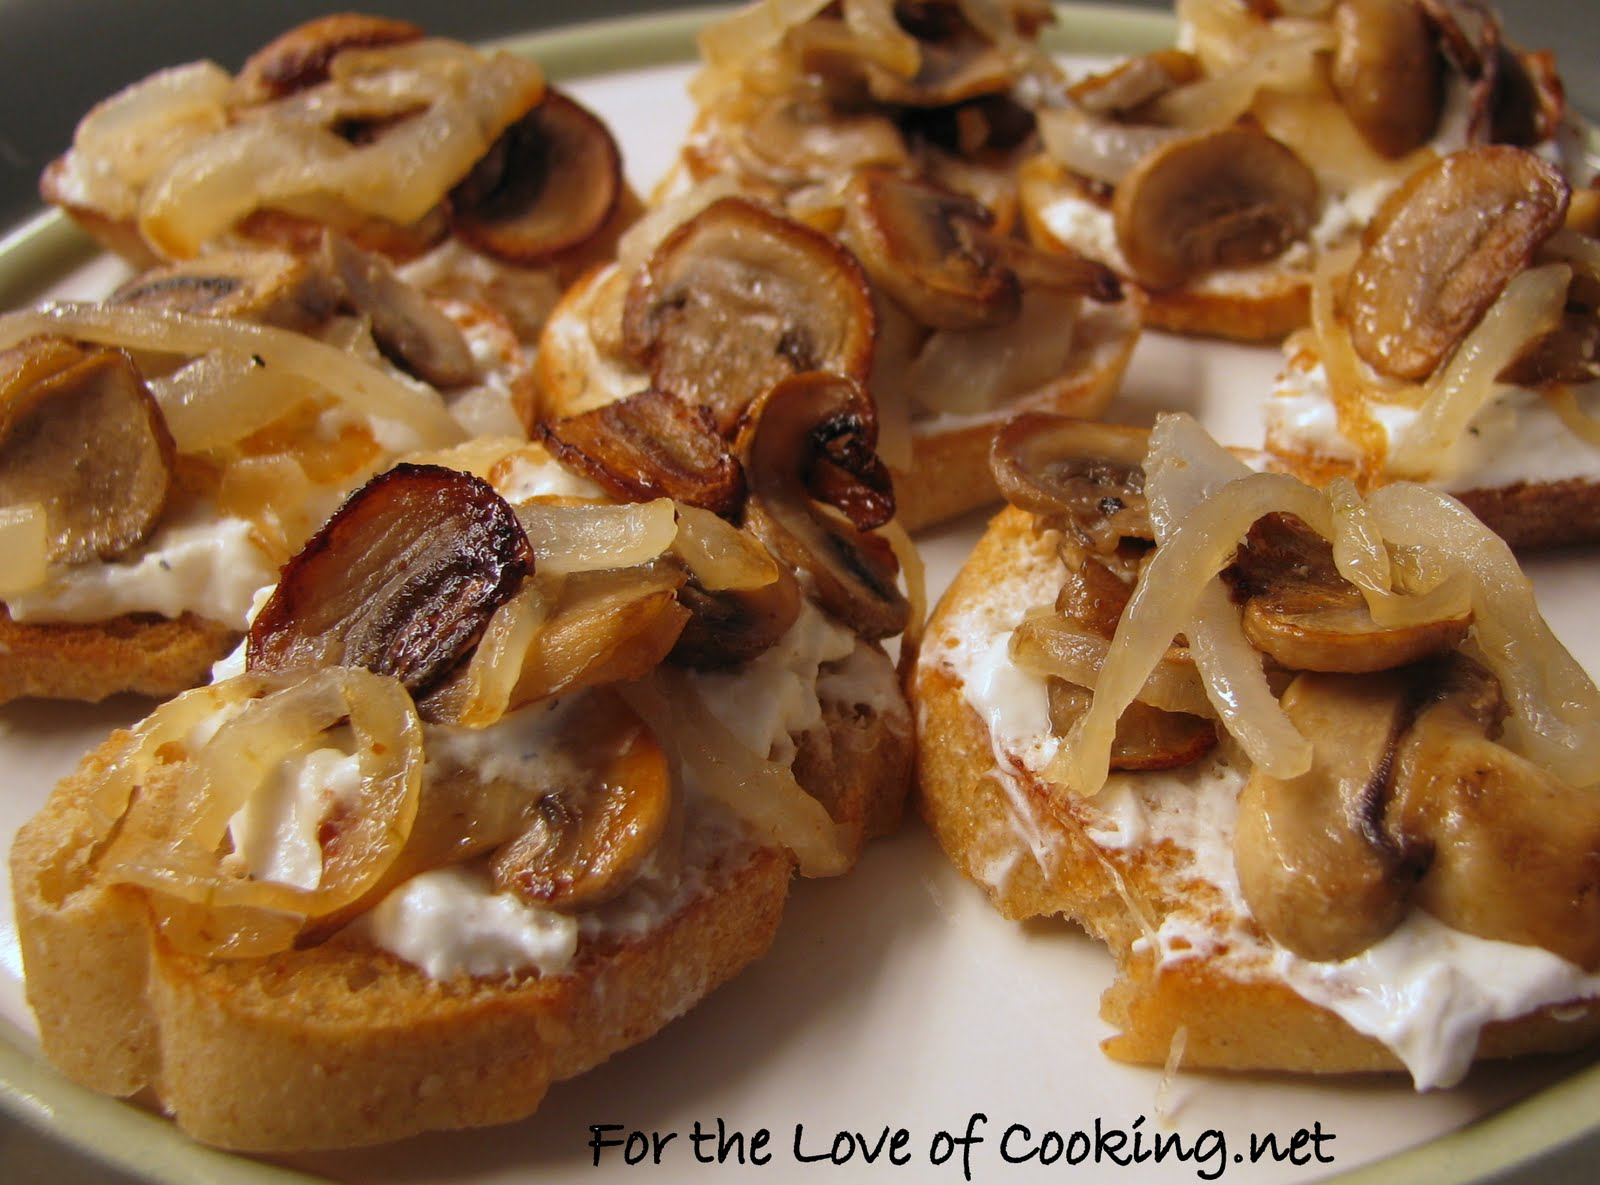 Caramelized Onion and Mushroom Crostini | Appetizers | Pinterest